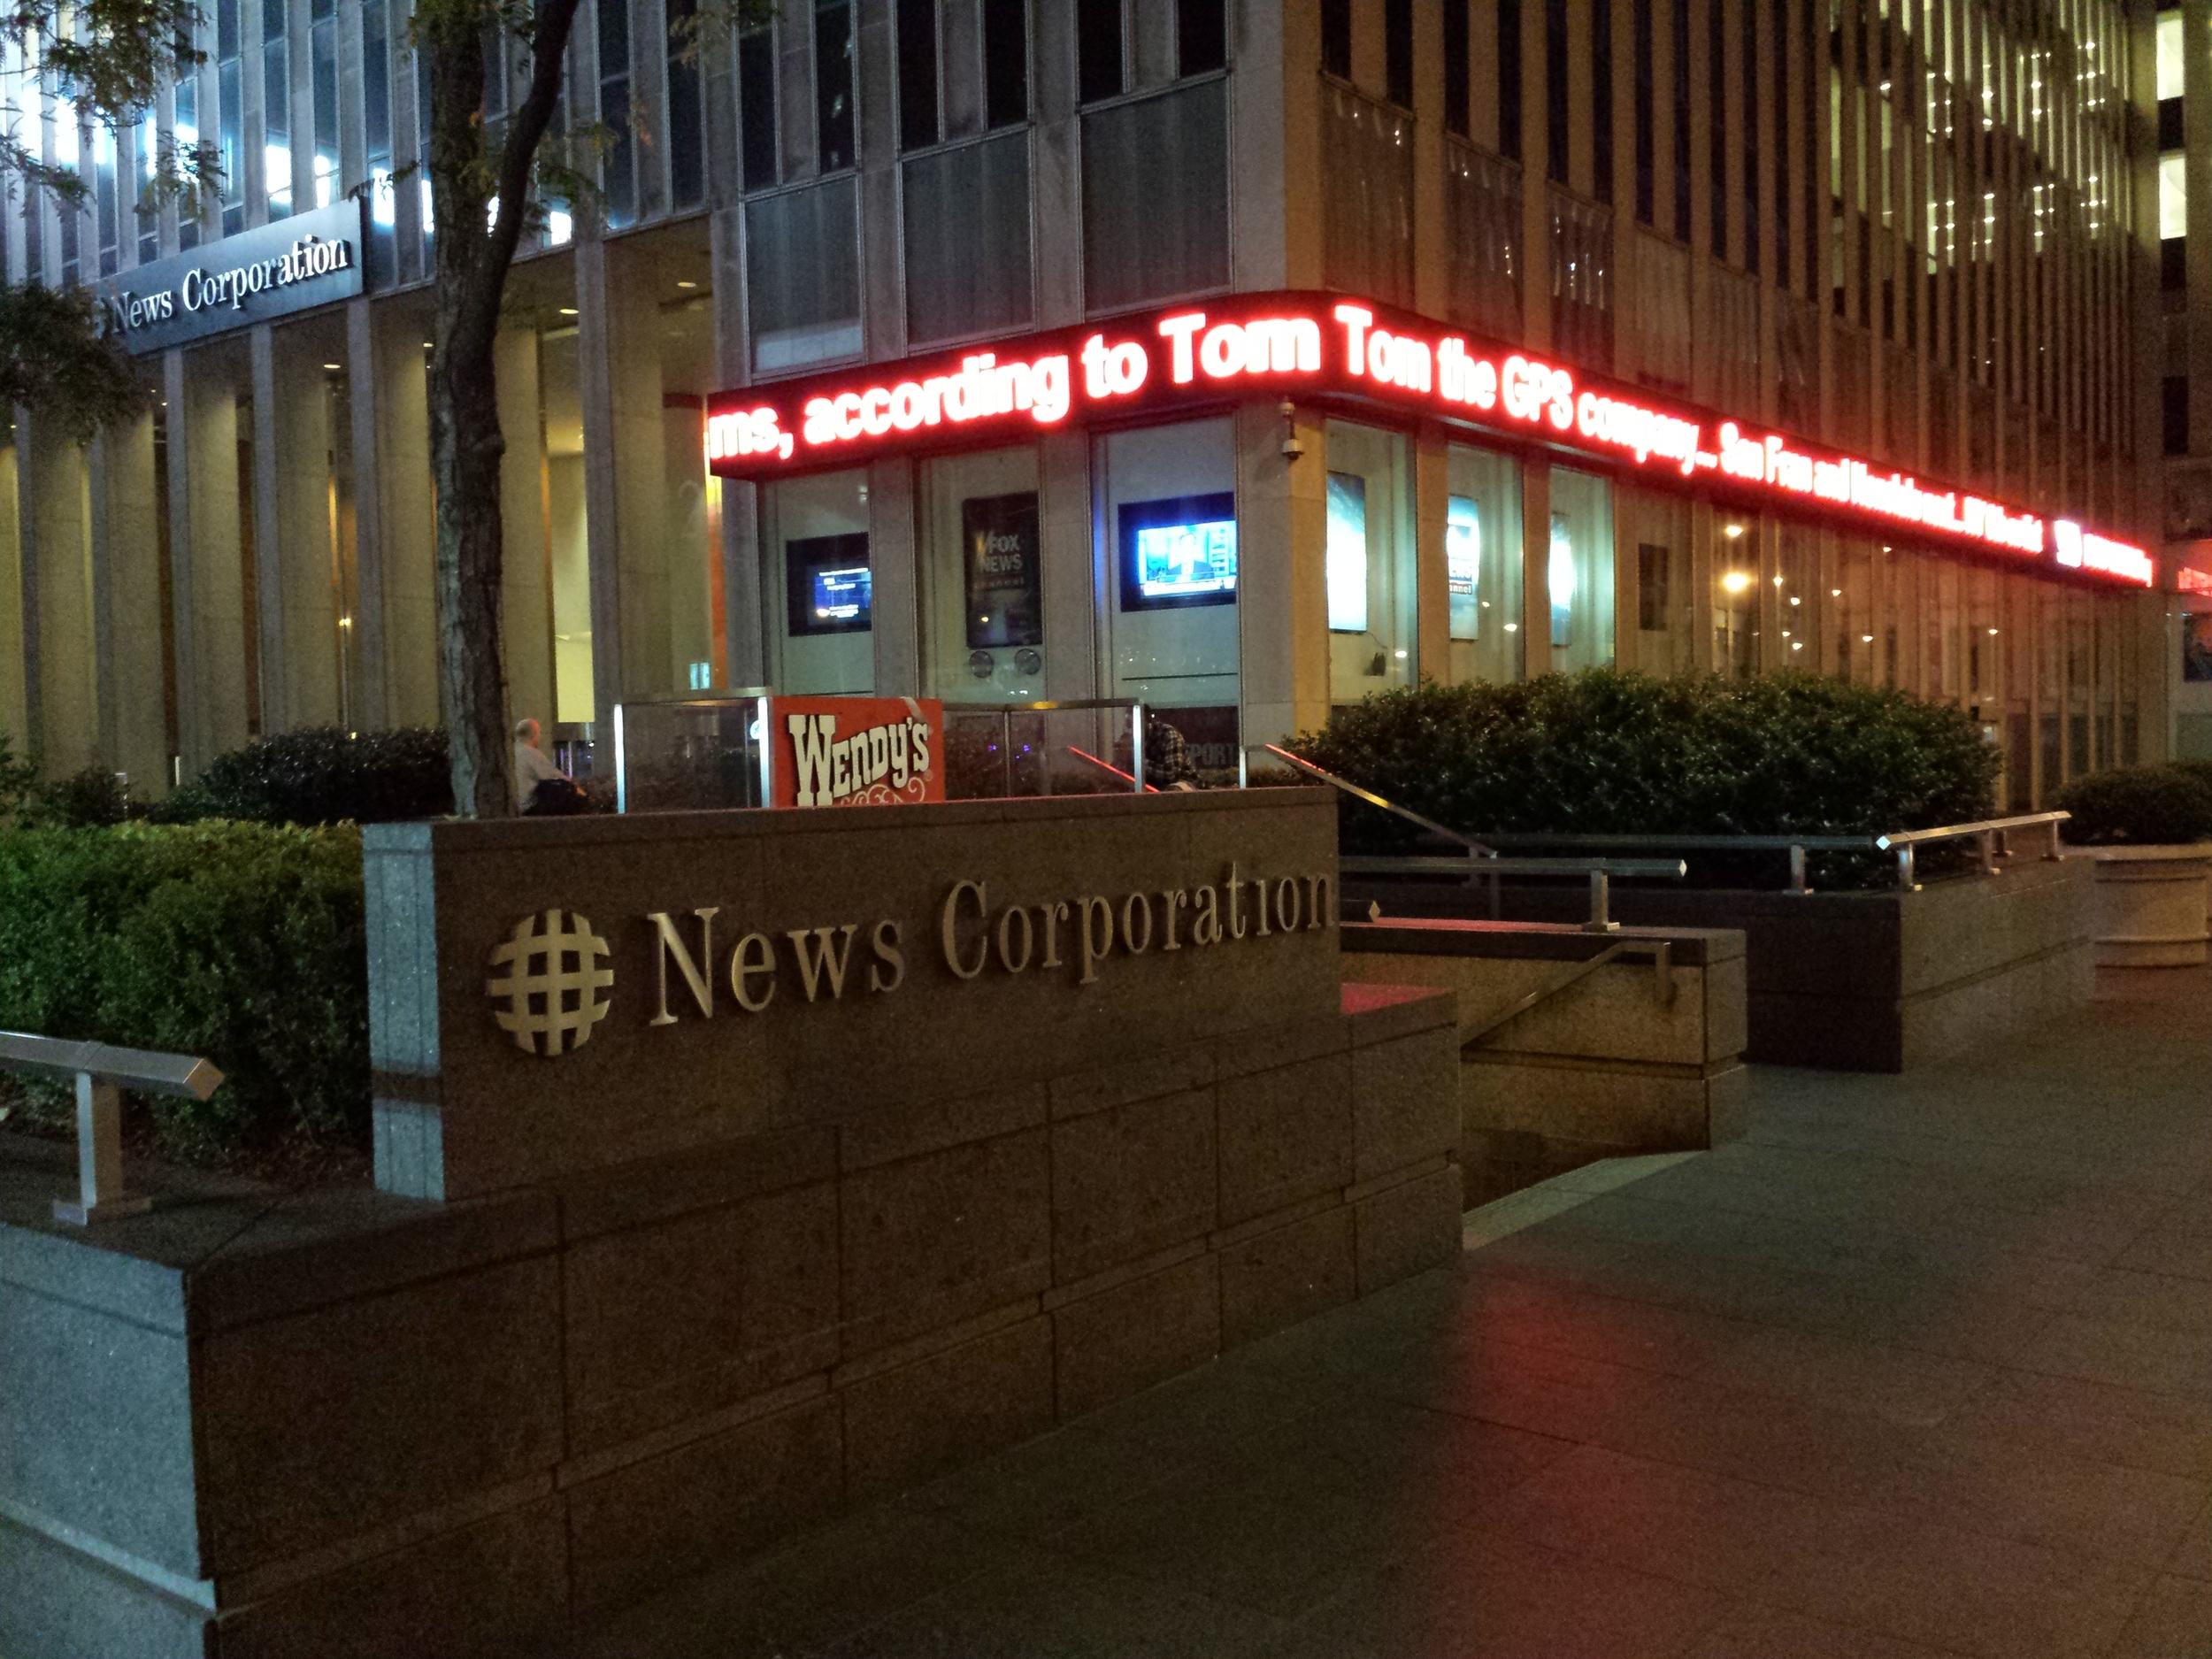 "Fox News Headquarters. Motto: ""We report, you decide."" I report this corner stank of urine."